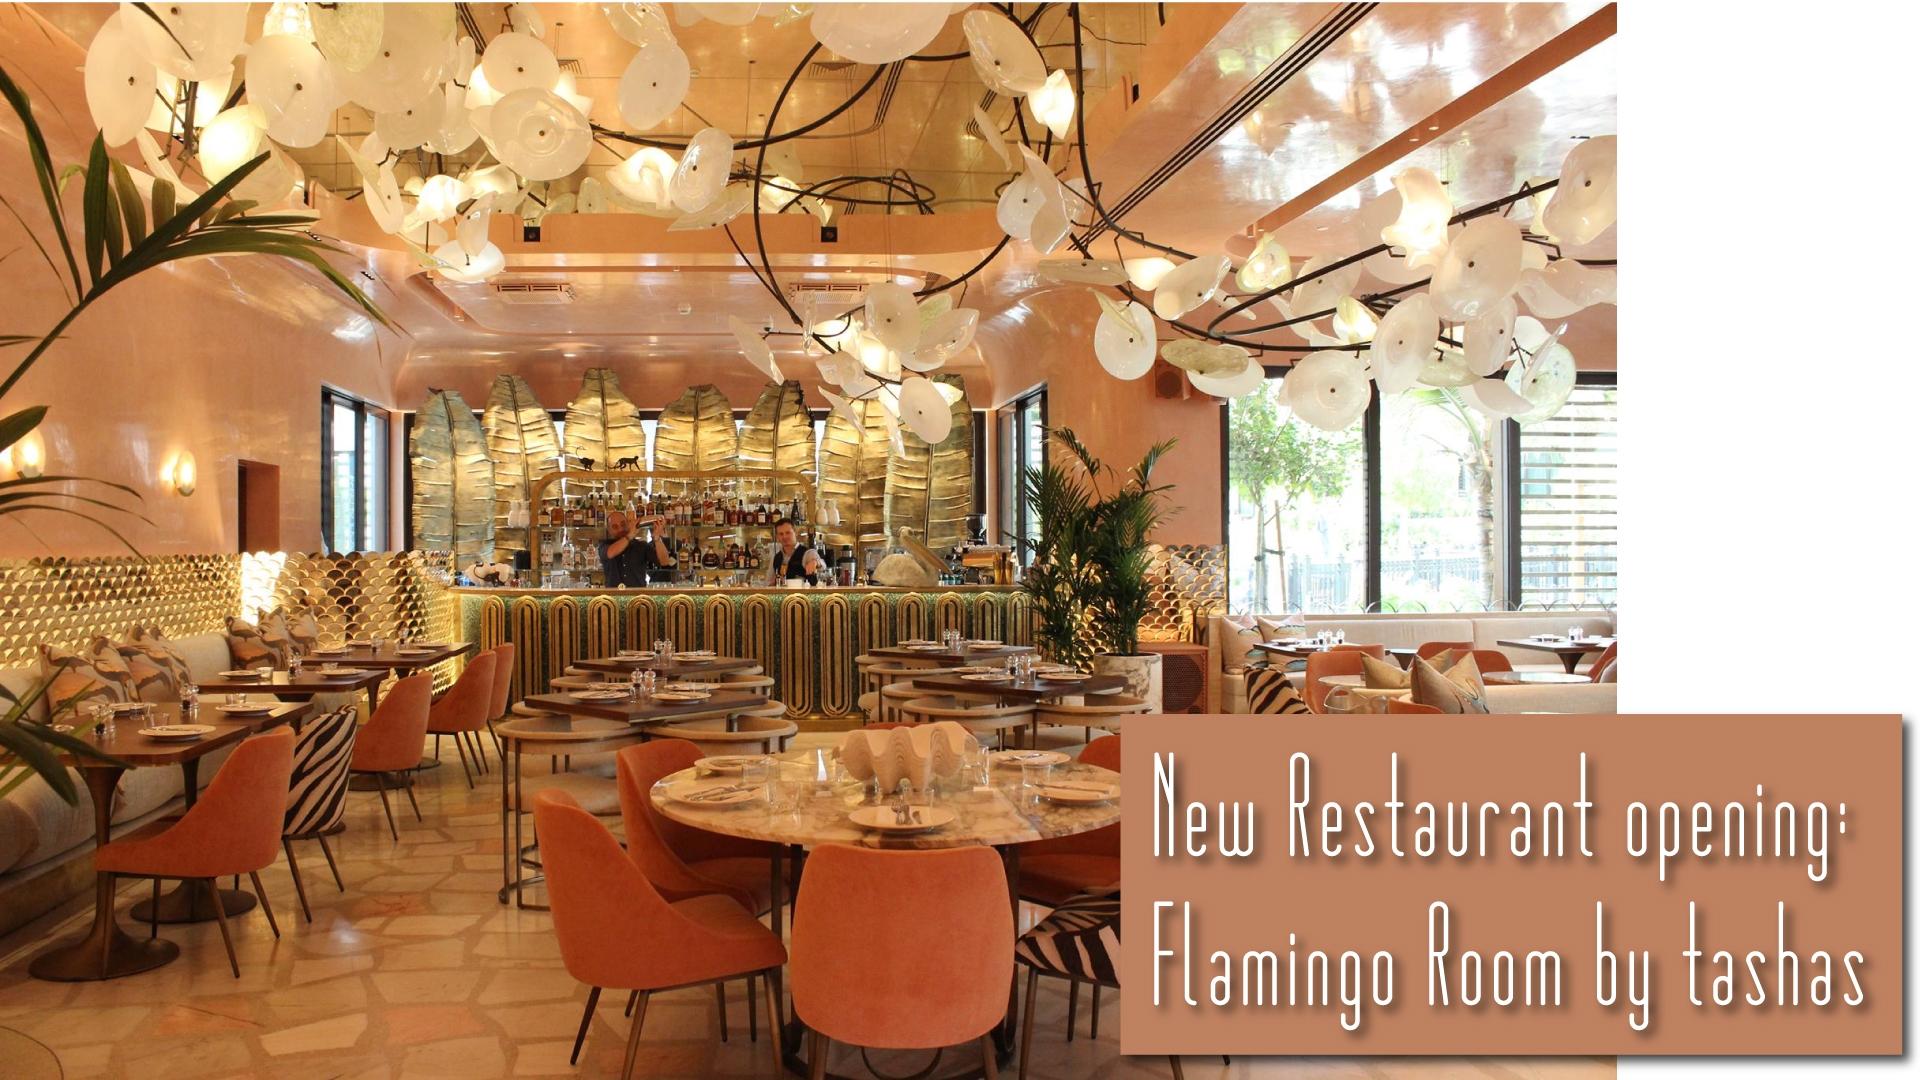 New Restaurant Opening Flamingo Room By Tashas Jumeirah